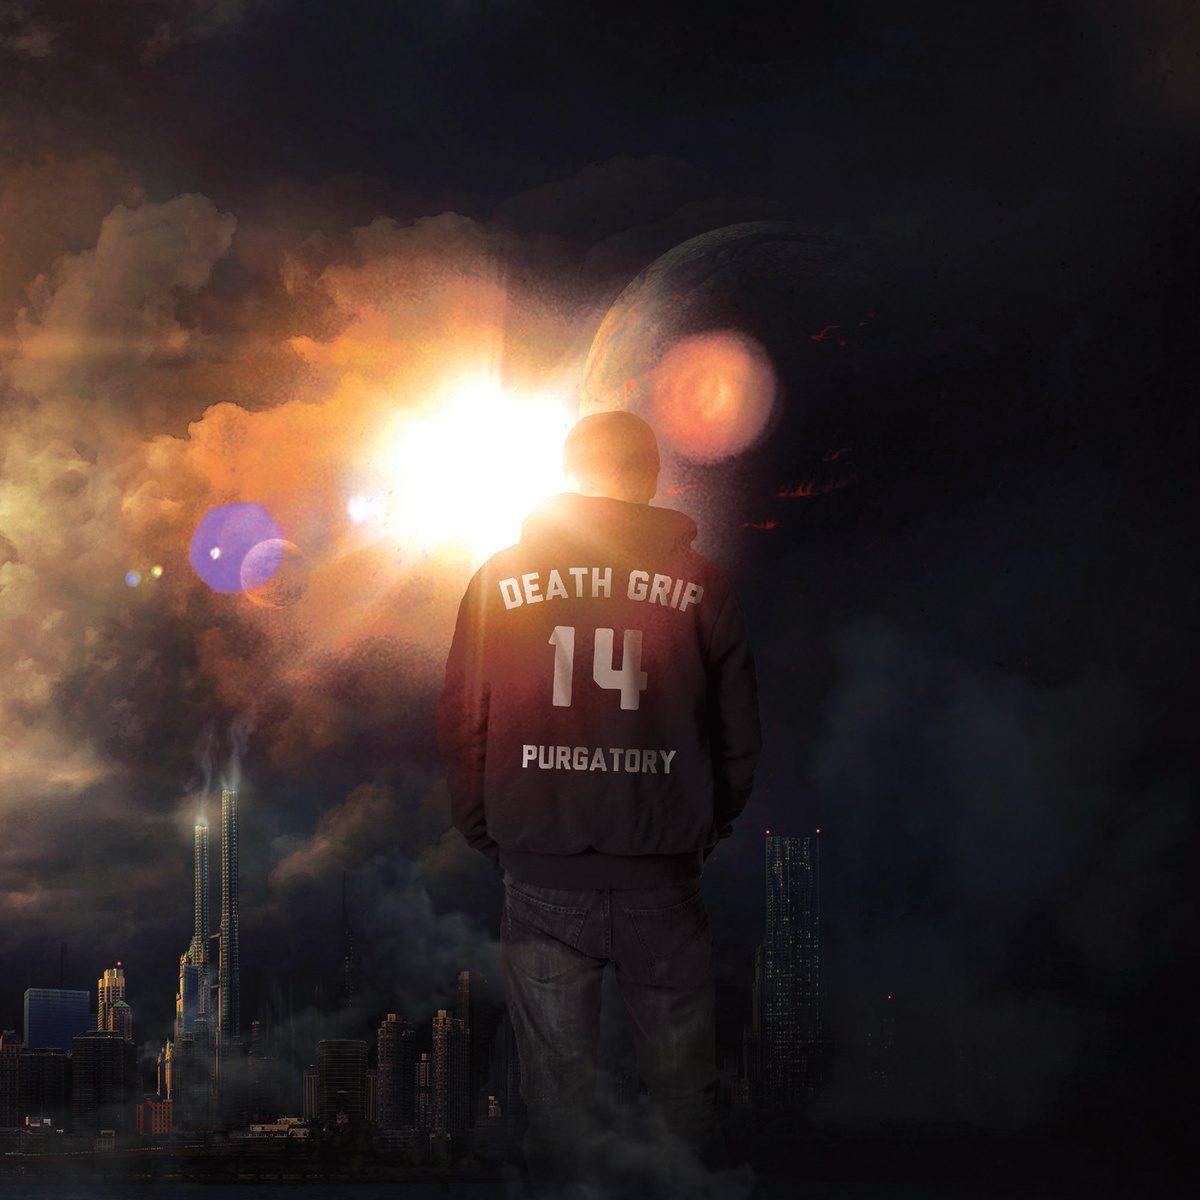 Header-Purgatory-DeathGrip-AlbumArt